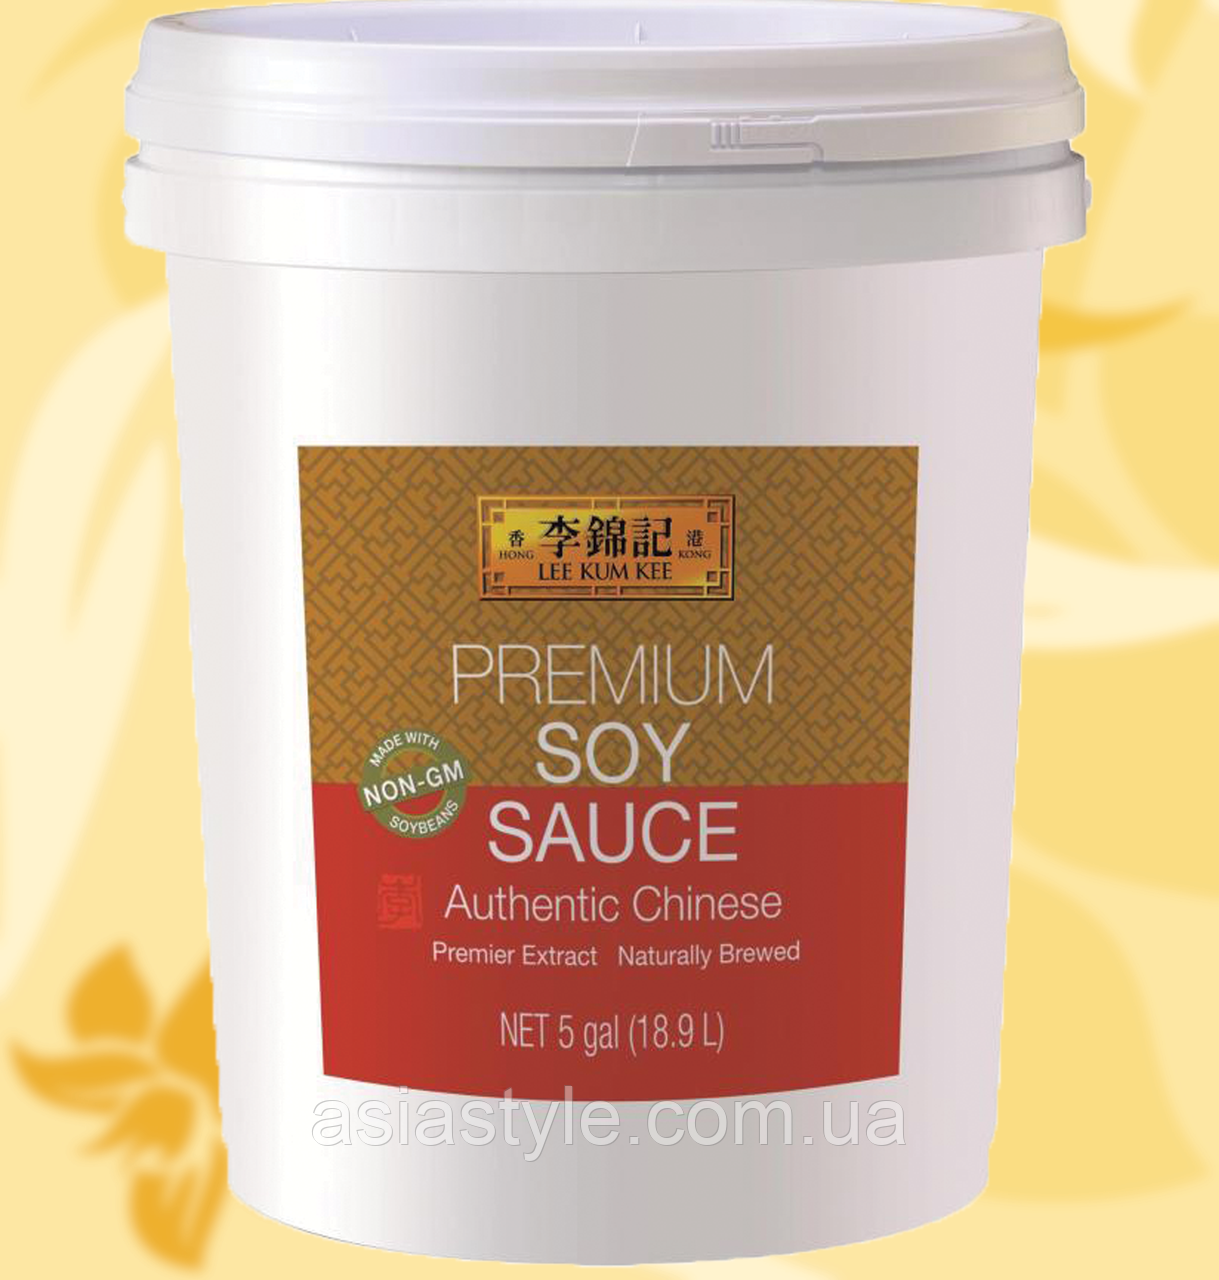 Соус соєвий, преміум, Premium Soy Sauce, Lee Kum Kee, 18.9 л, МоМА